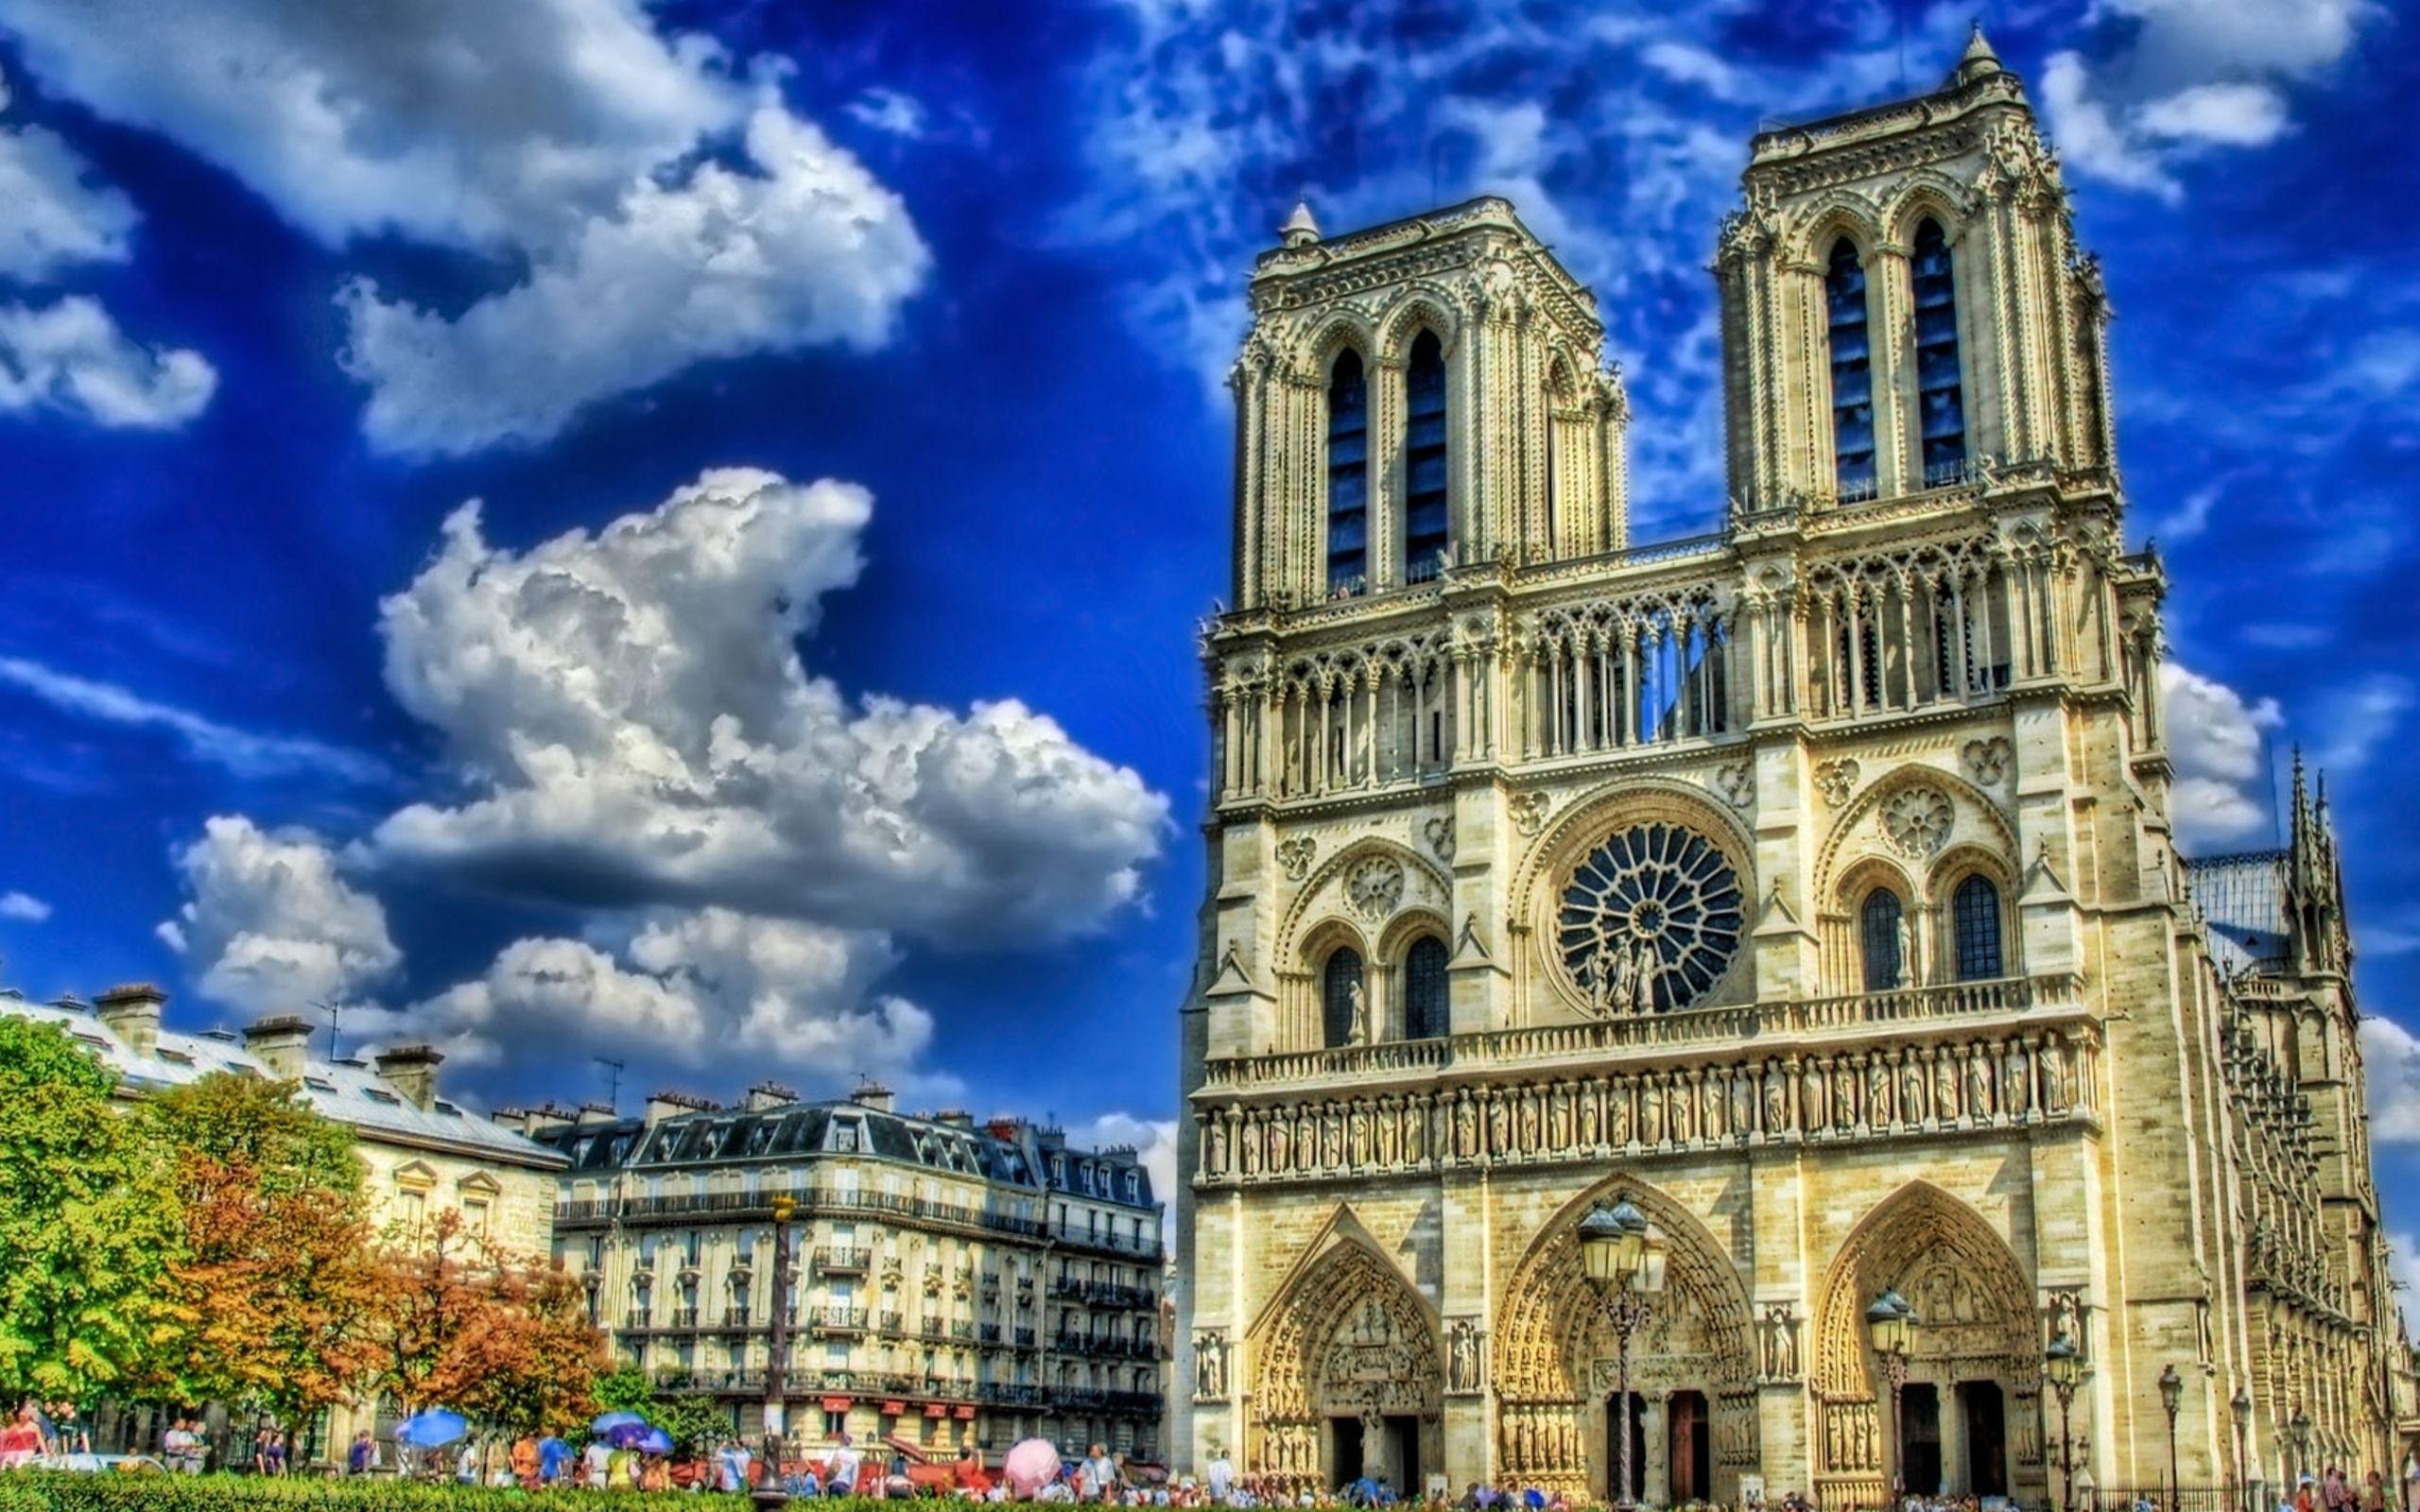 парижской богоматери собор фото